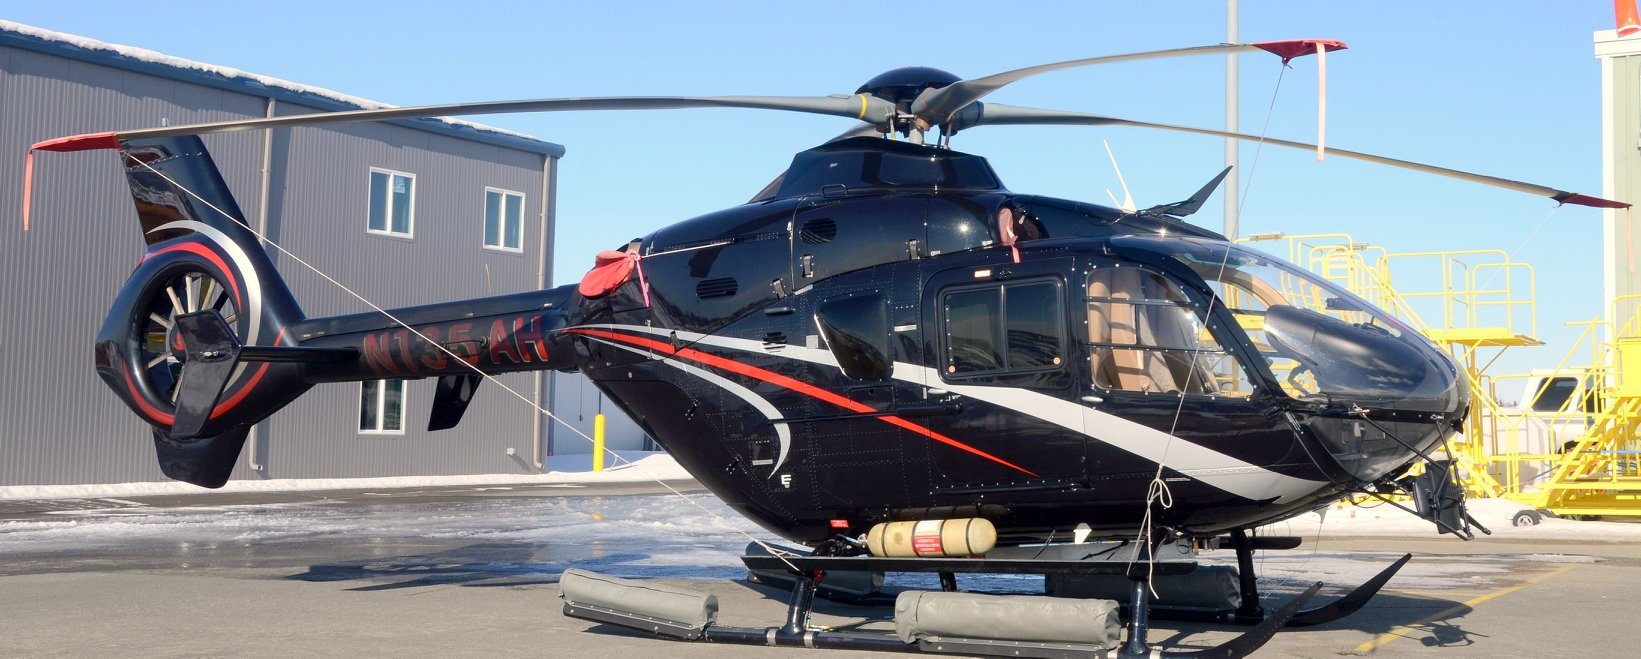 AIRBUS H135 - Descriptive Copy